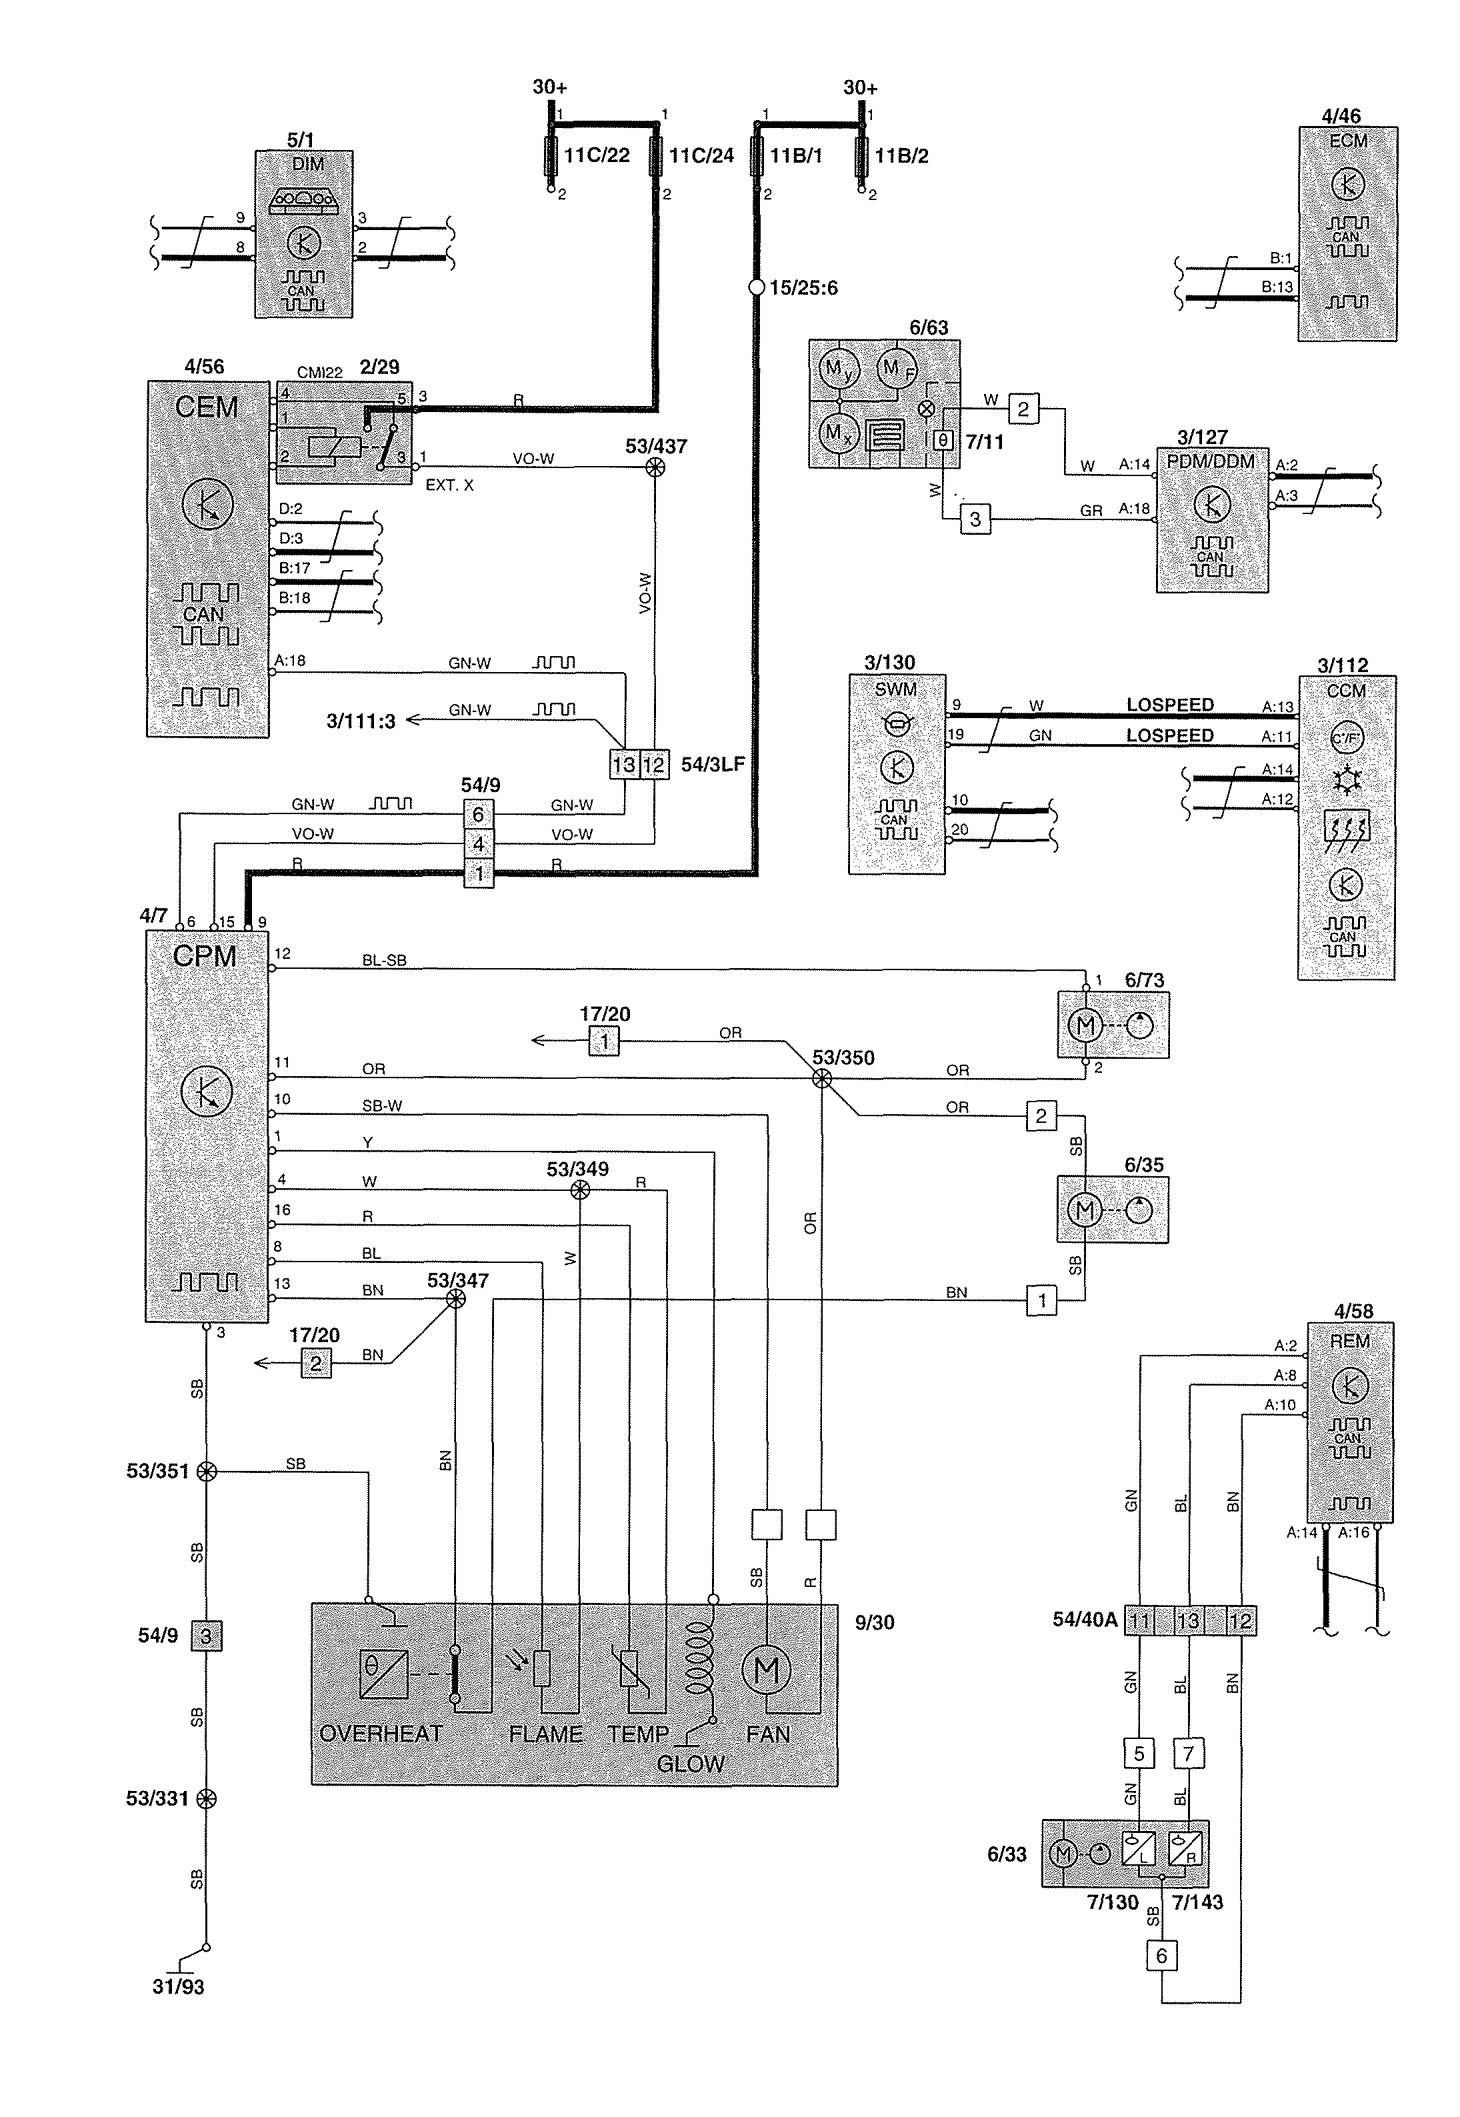 Volvo S80 2000 Wiring Diagram Wiring Volvo S60 Window Wiring Diagram Full Quality Of Volvo S80 2000 Wiring Diagram